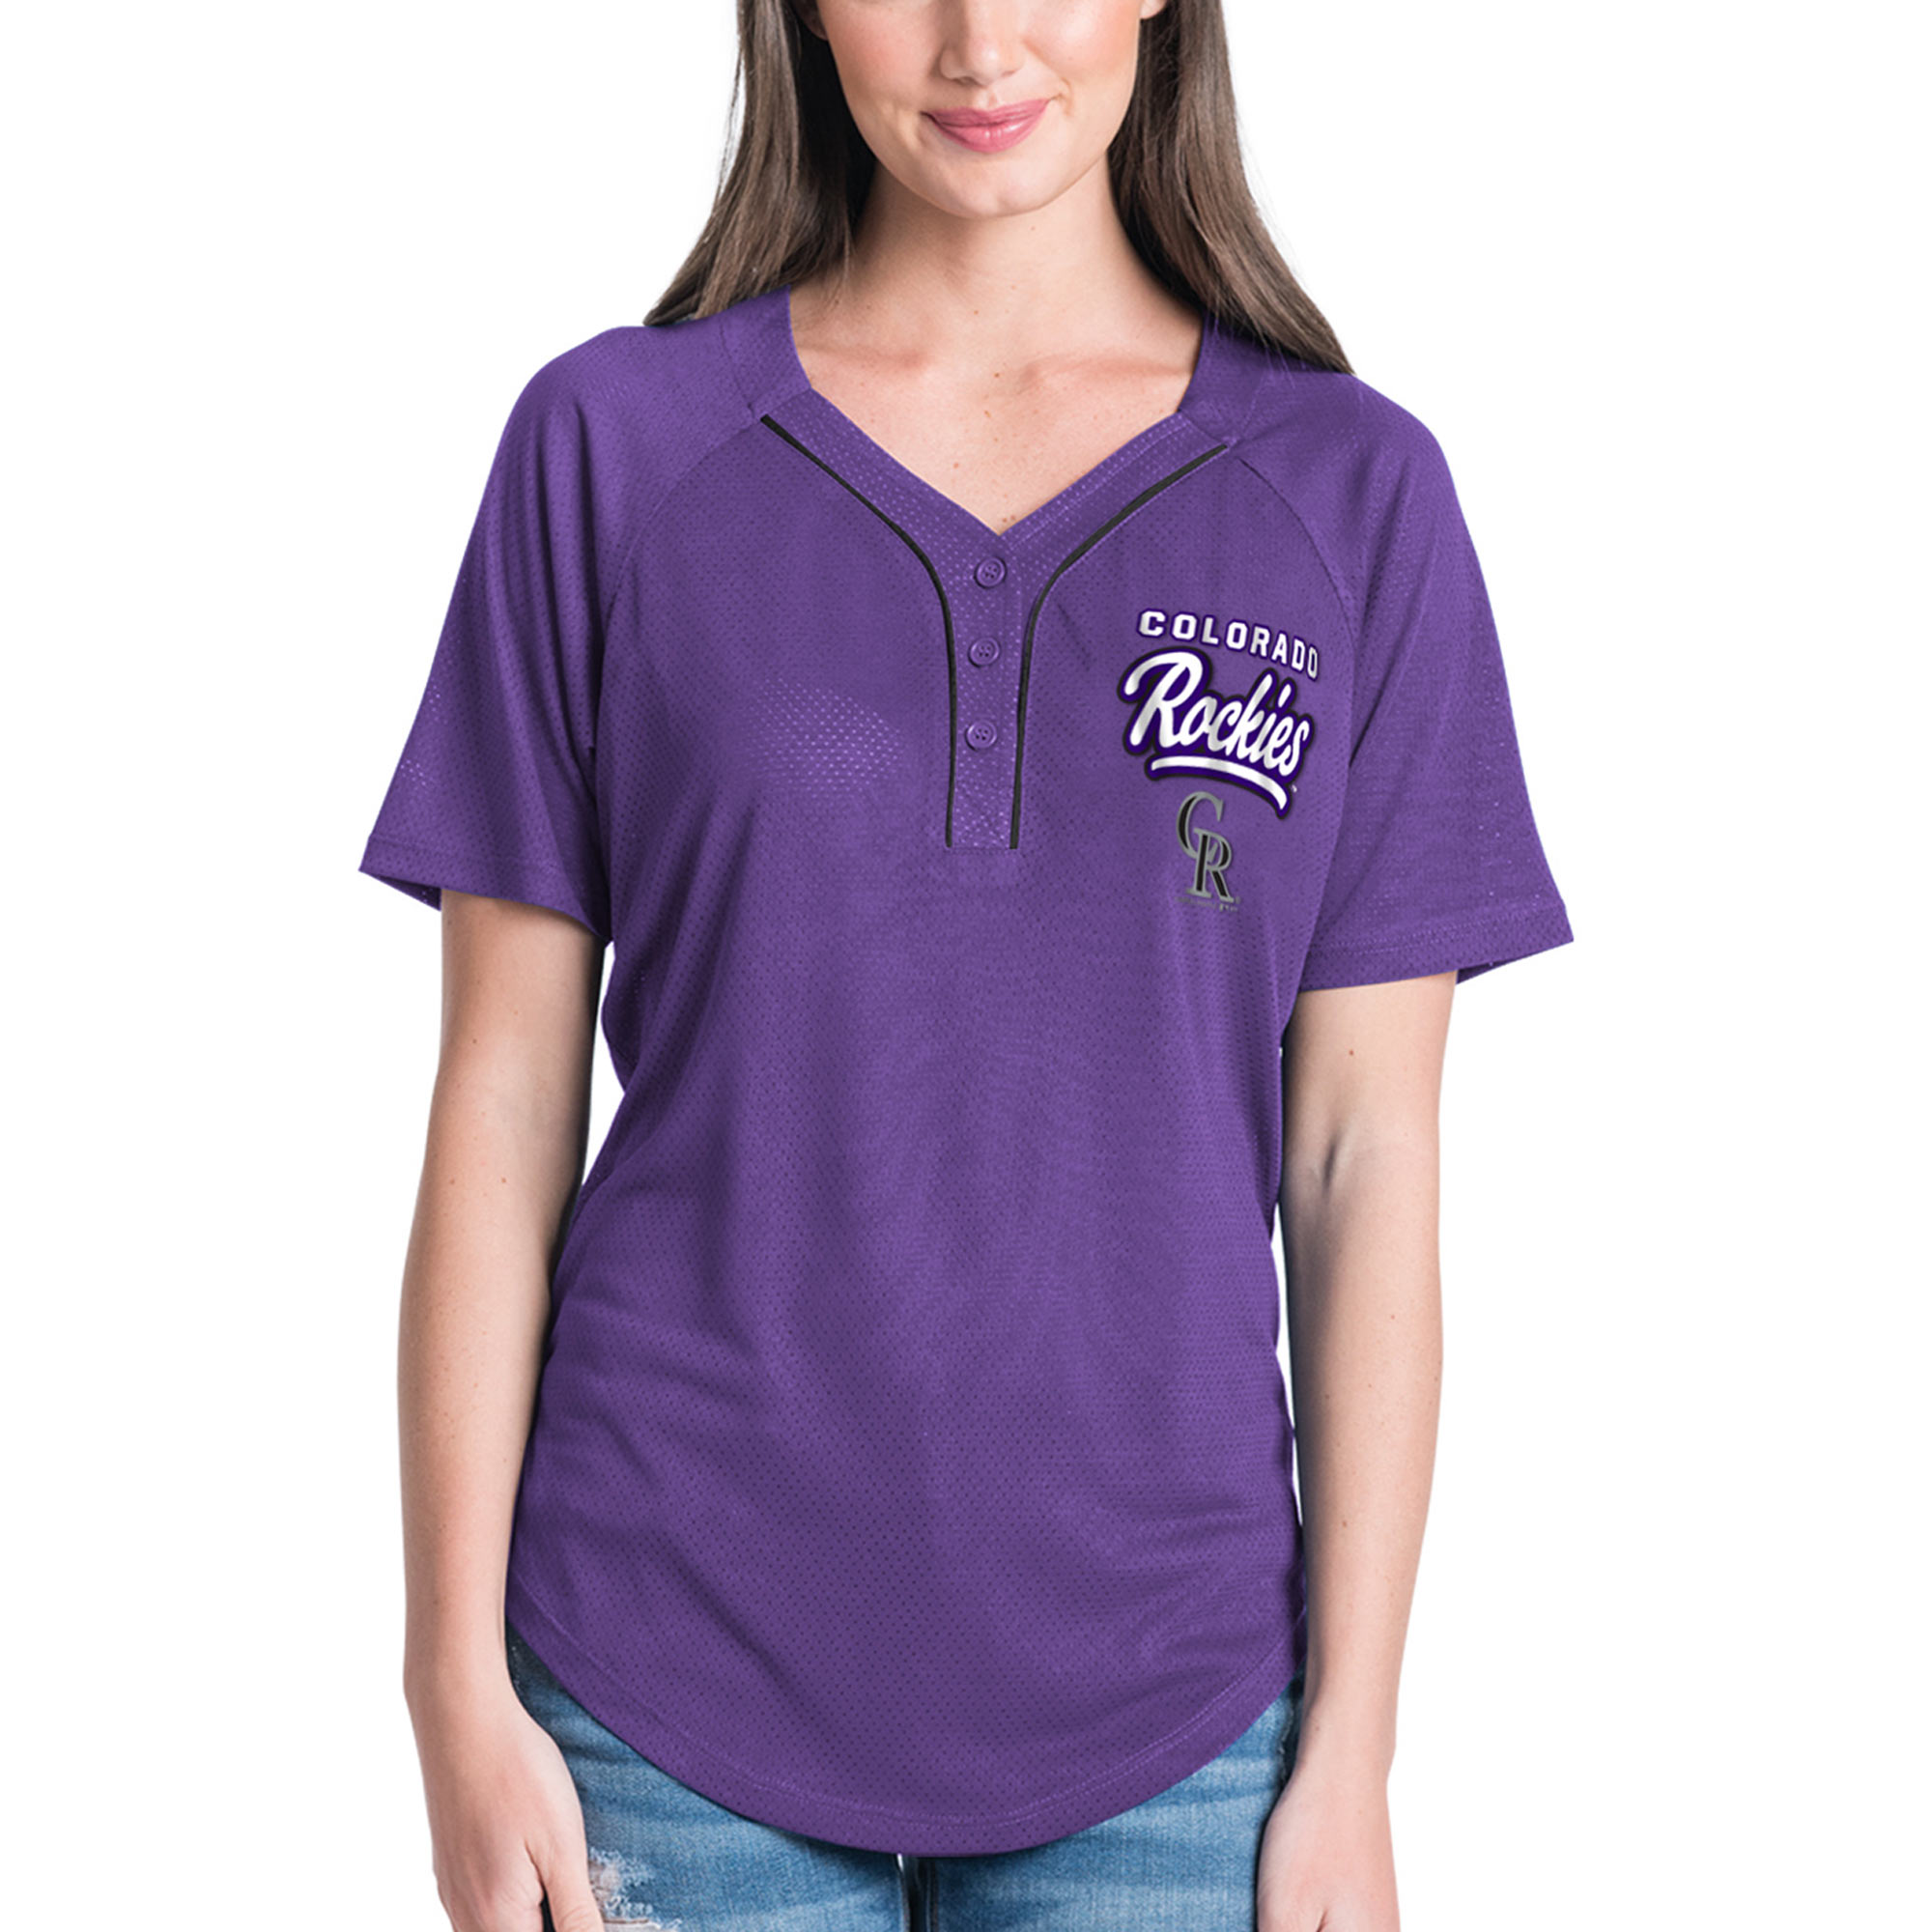 Women's New Era Purple Colorado Rockies Henley Mesh Jersey T-Shirt